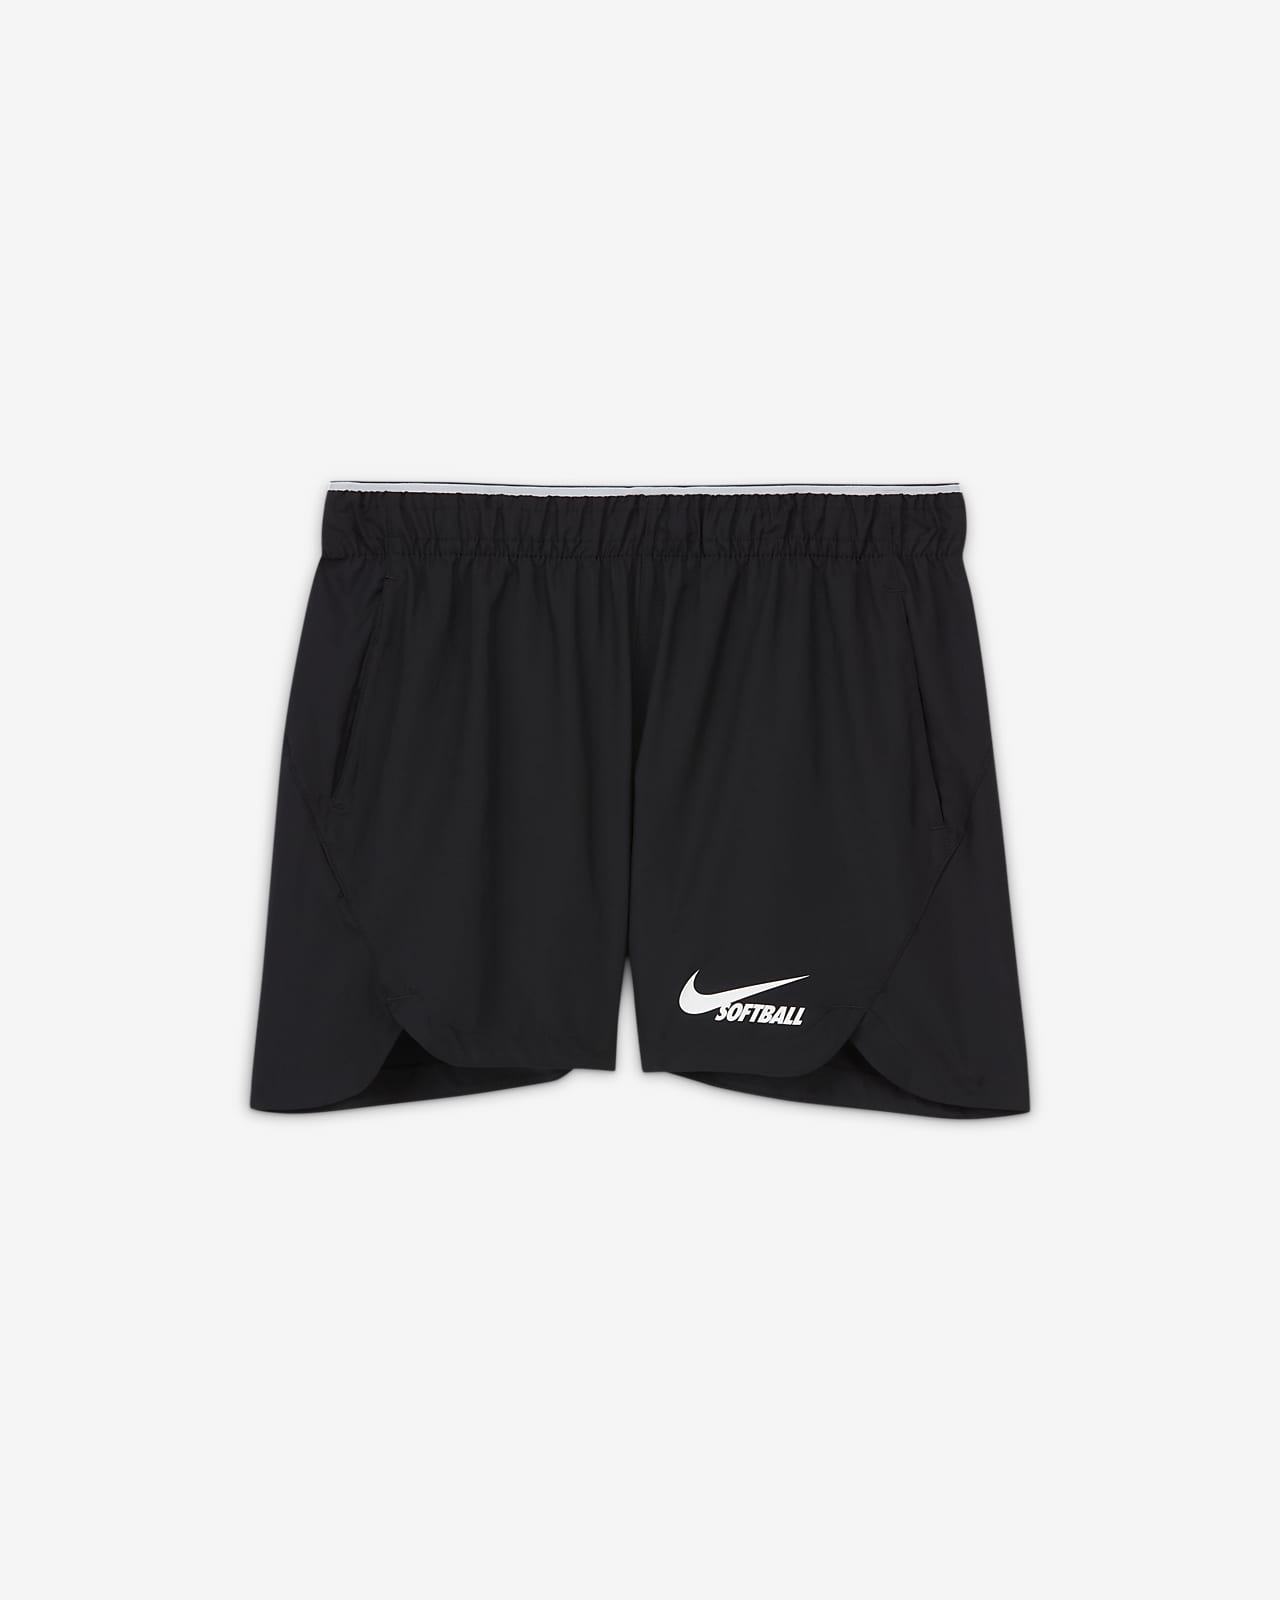 Nike Dri-FIT Women's Softball Shorts